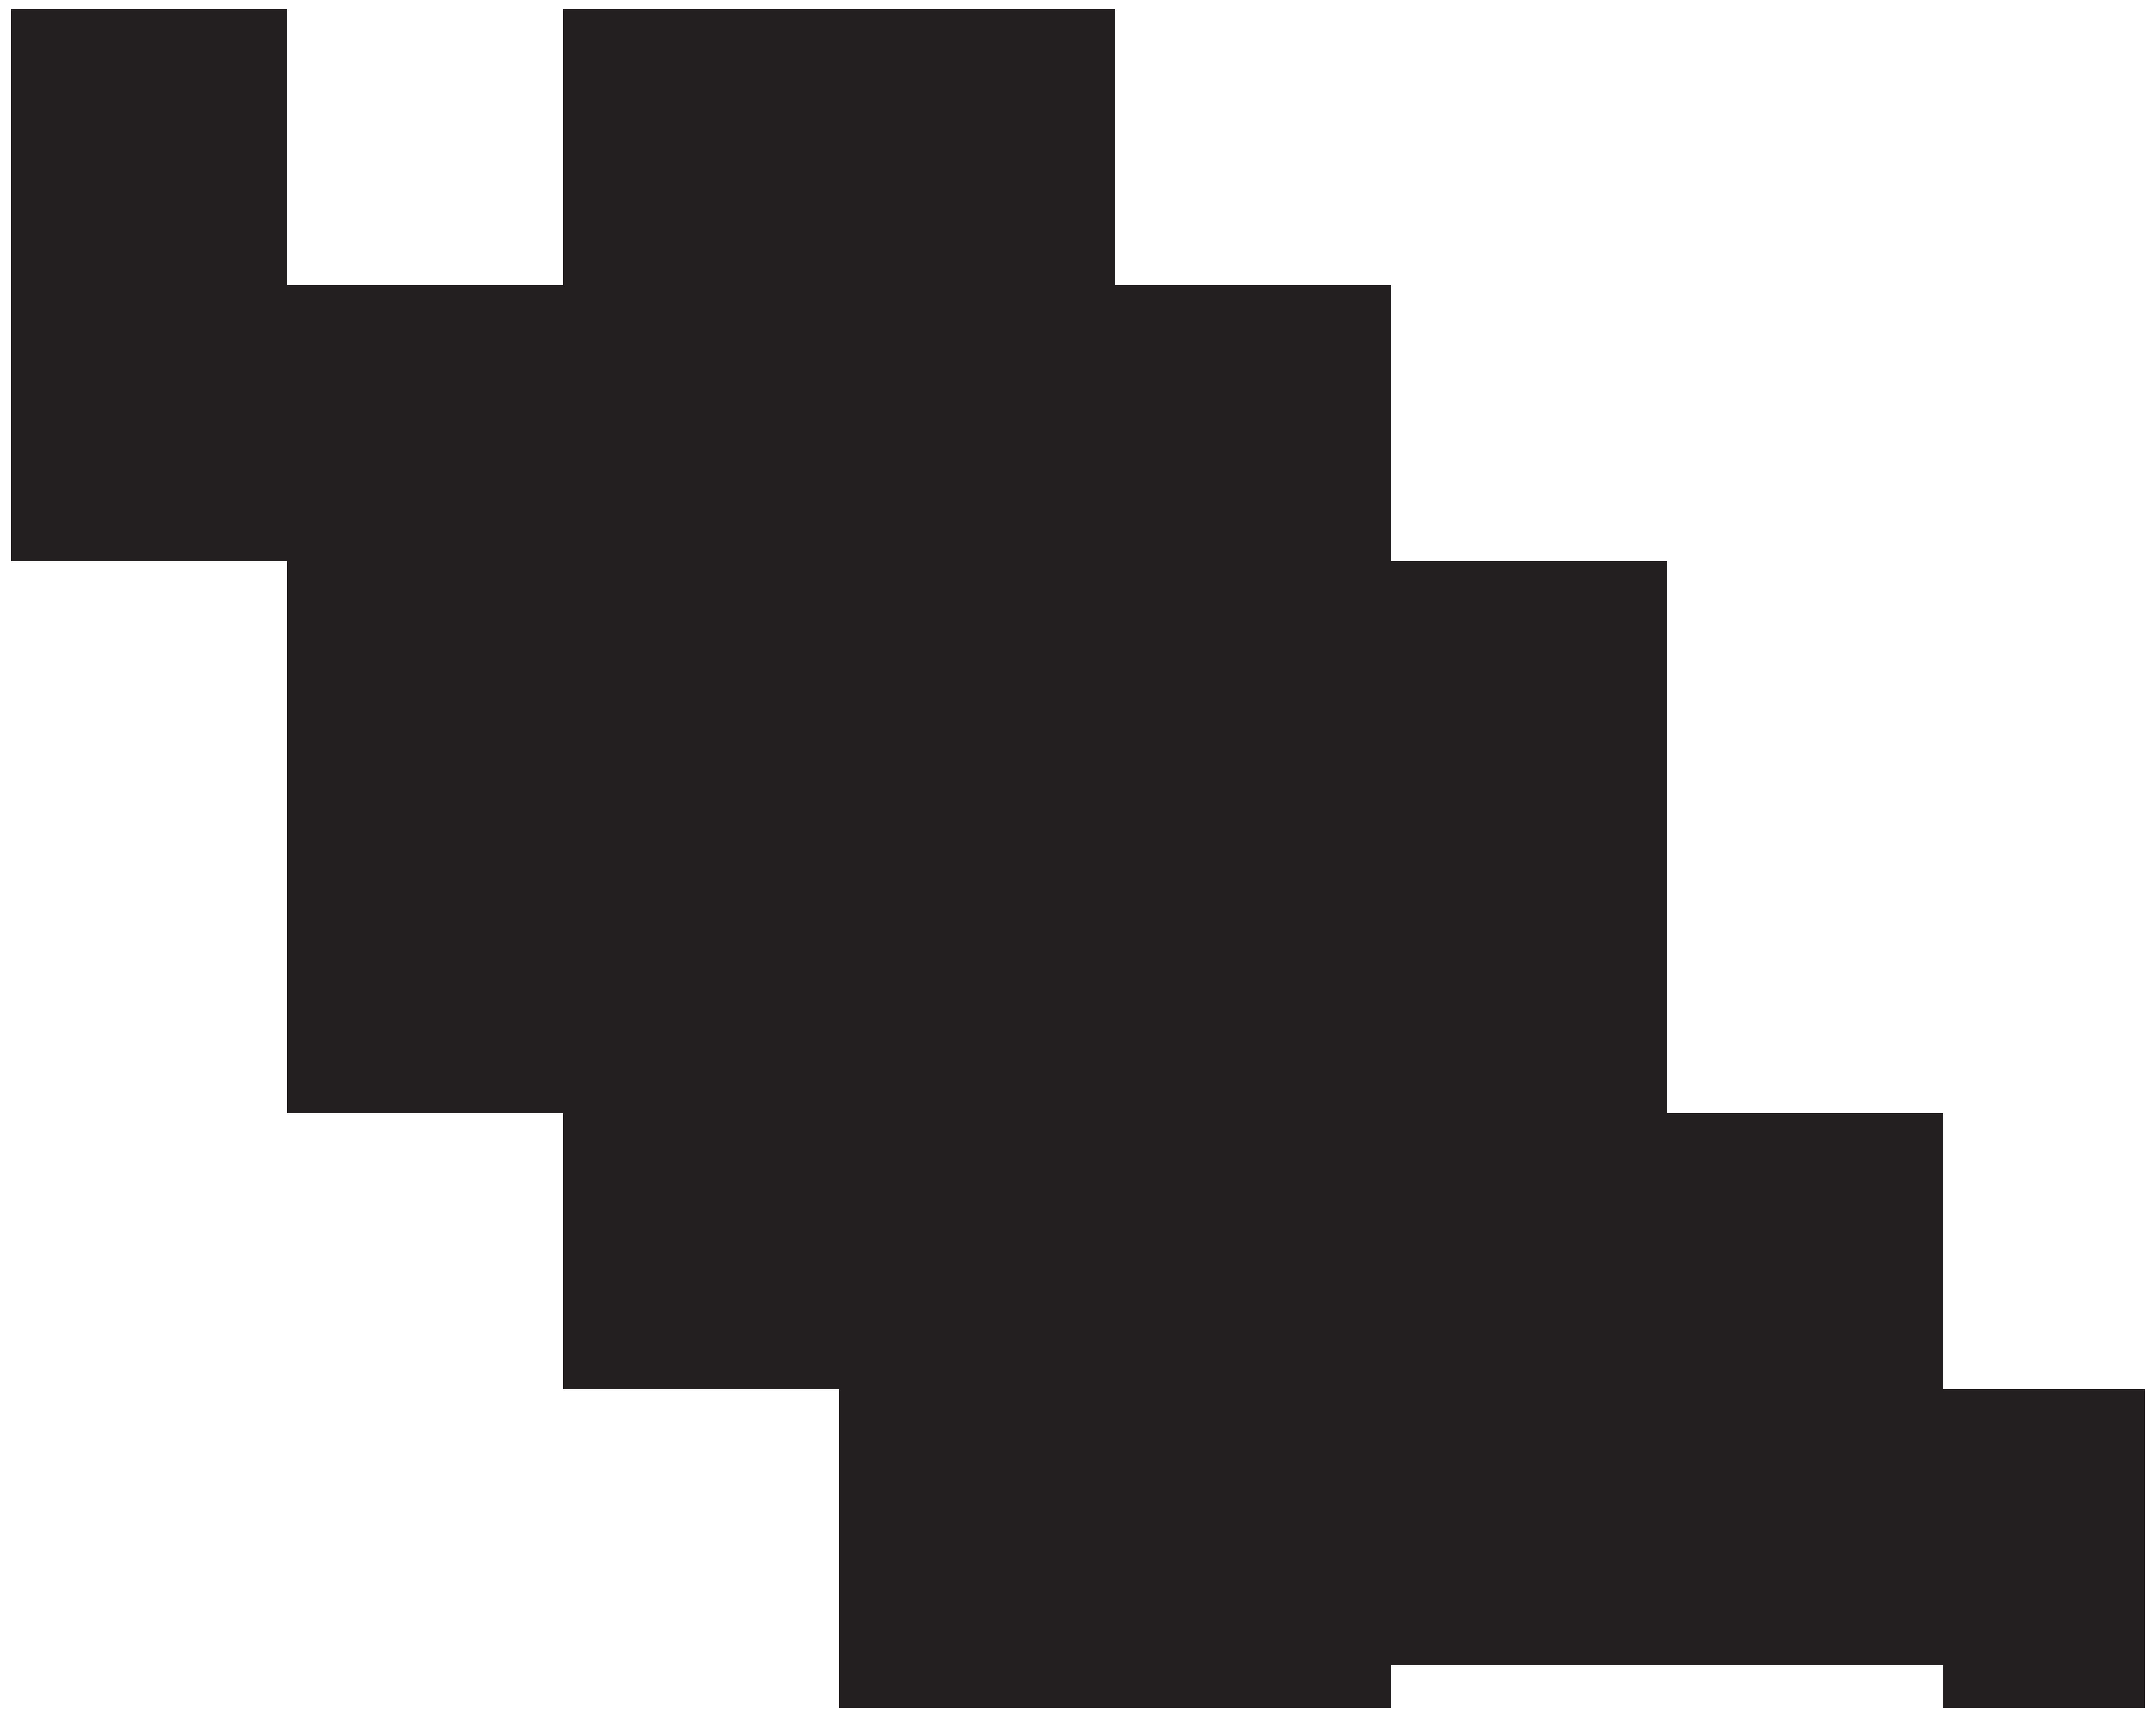 Clipart sports cricket.